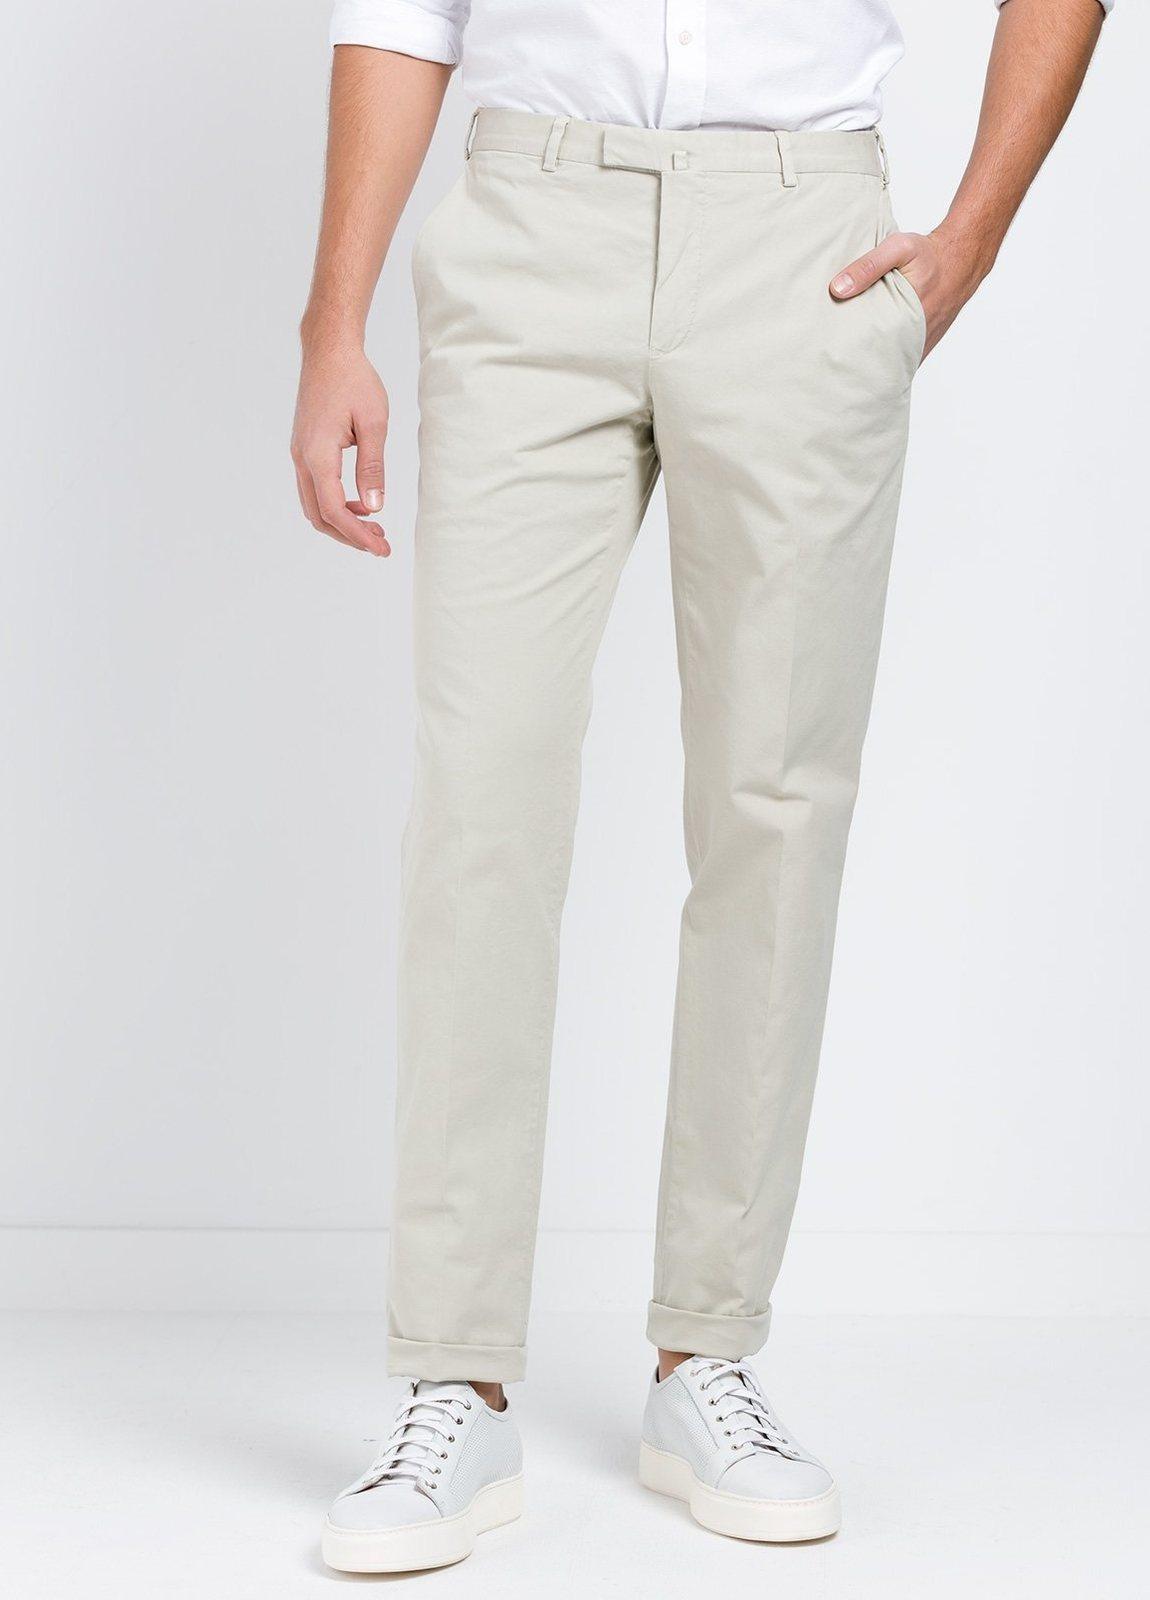 Pantalón Sport SLIM FIT , modelo INCO, color beige, 98% Algodón 2% Elastano. - Ítem3